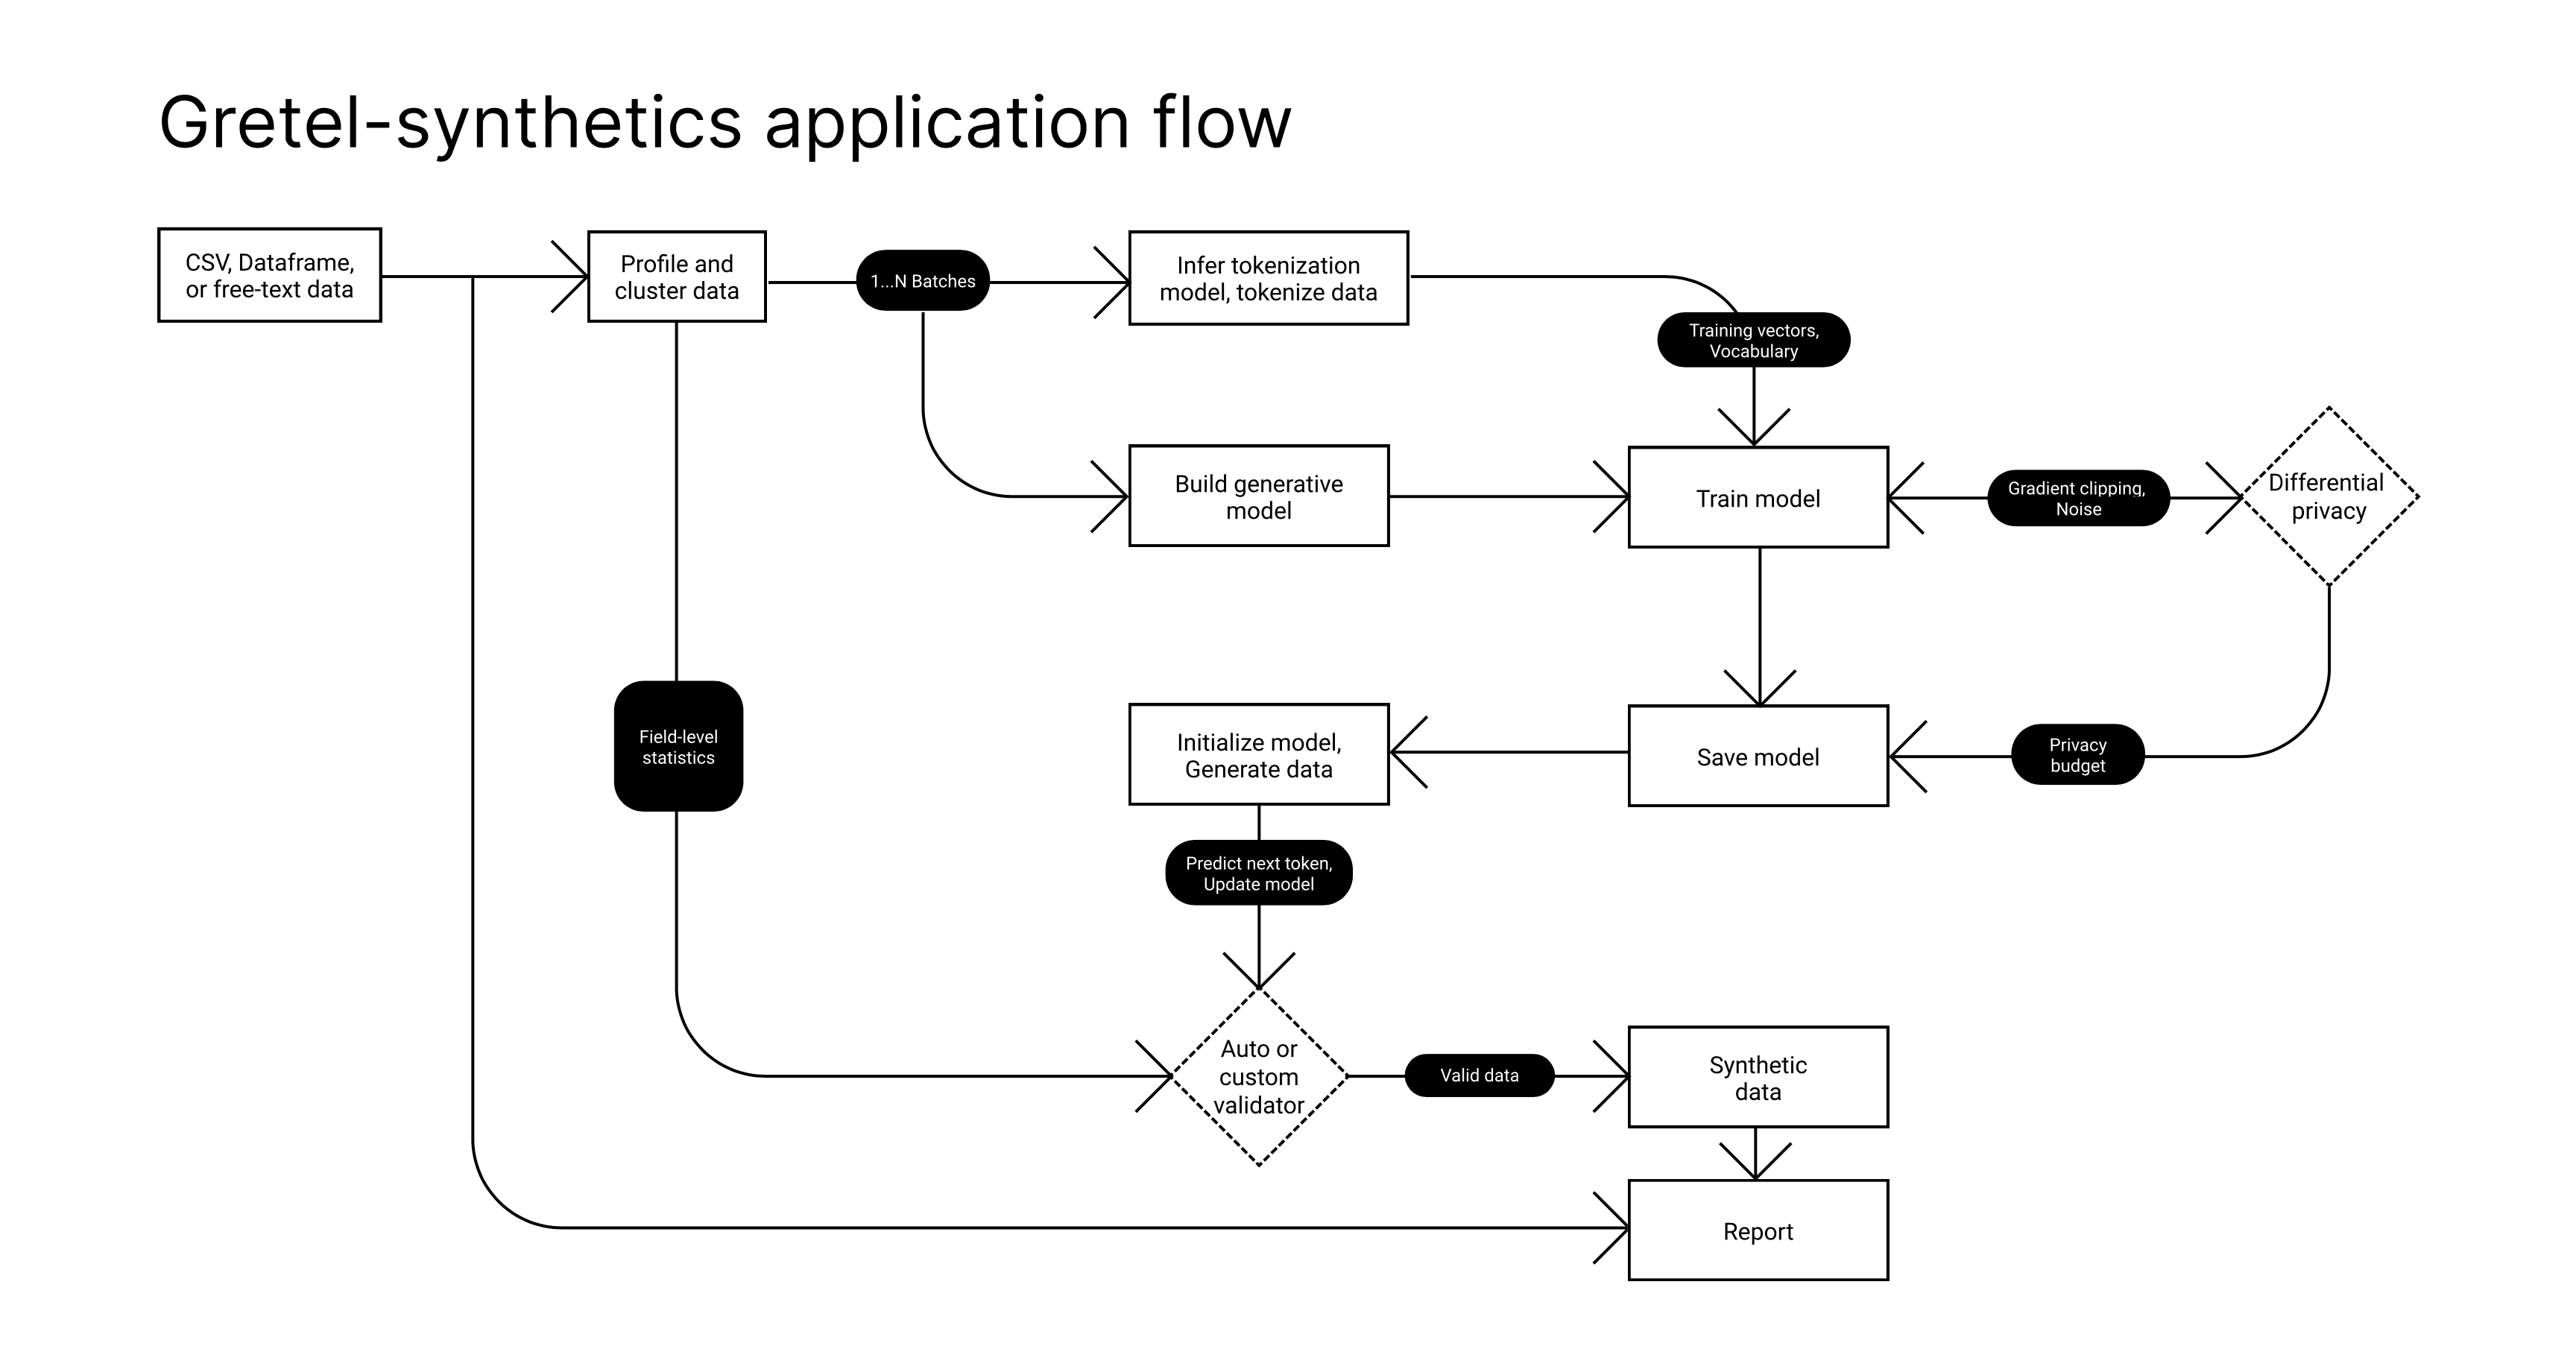 gretel-synthetics synthetic data architecture